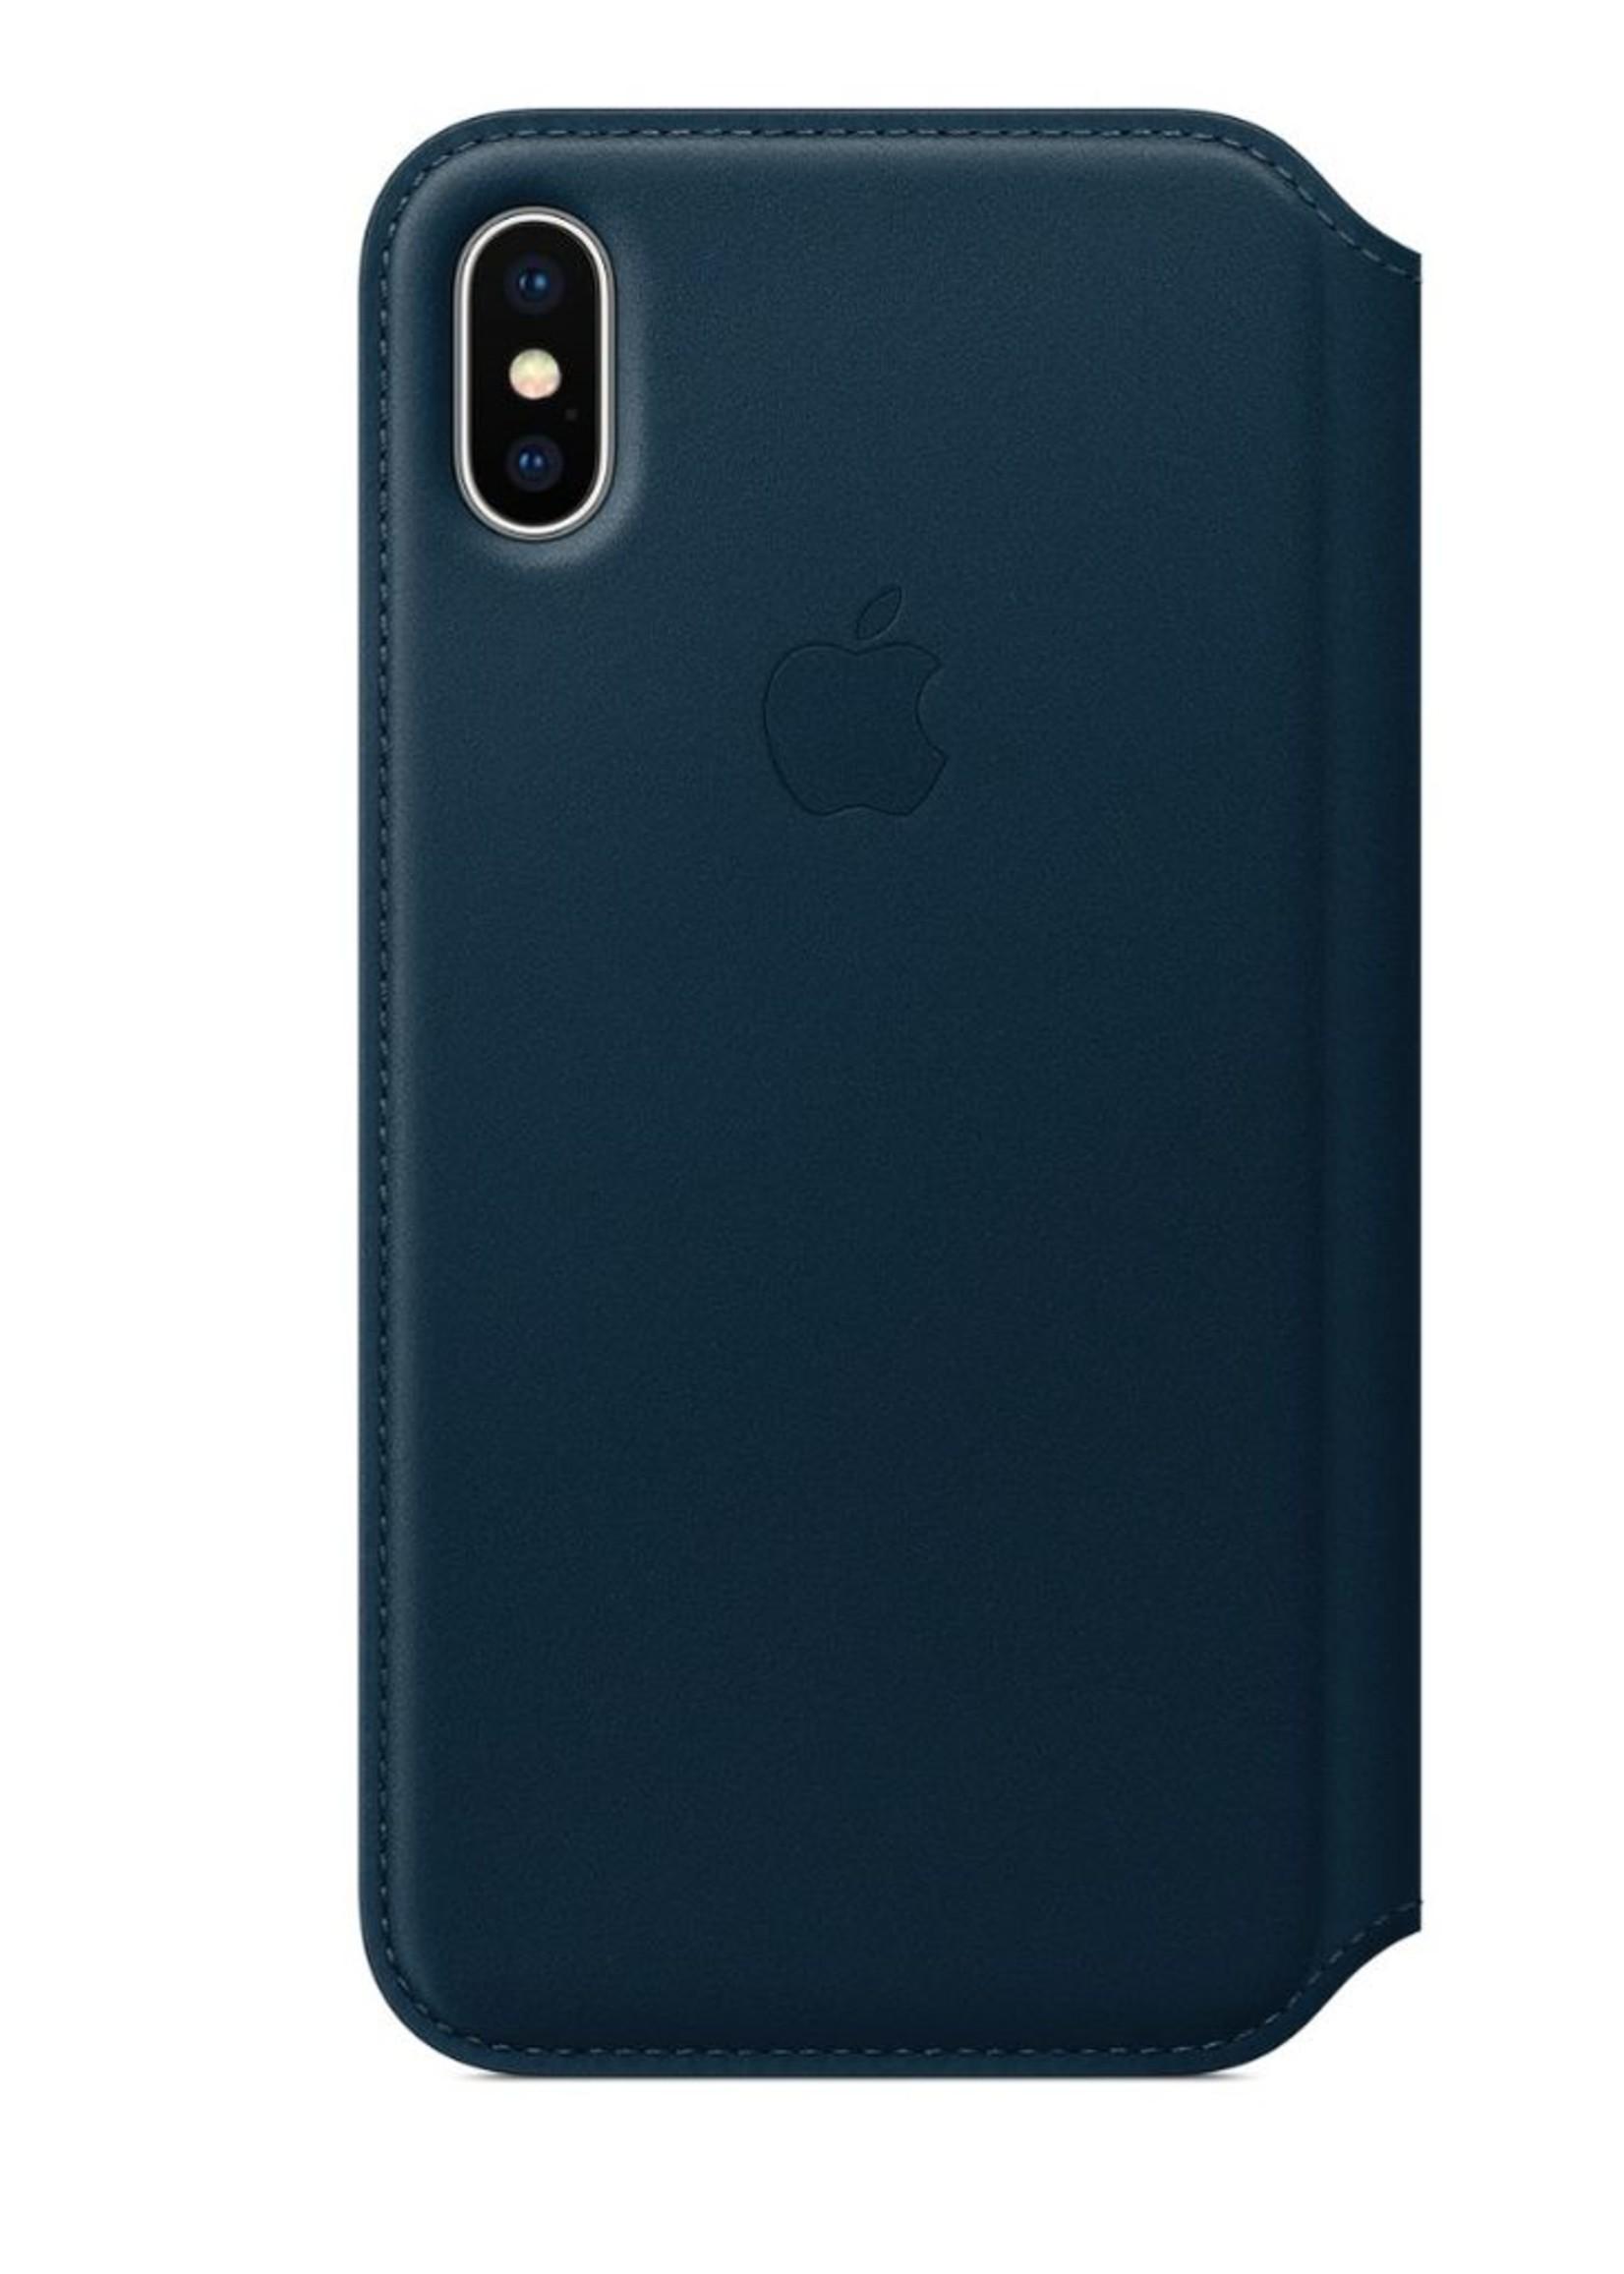 iPhone X Leather Folio - Cosmos Blue